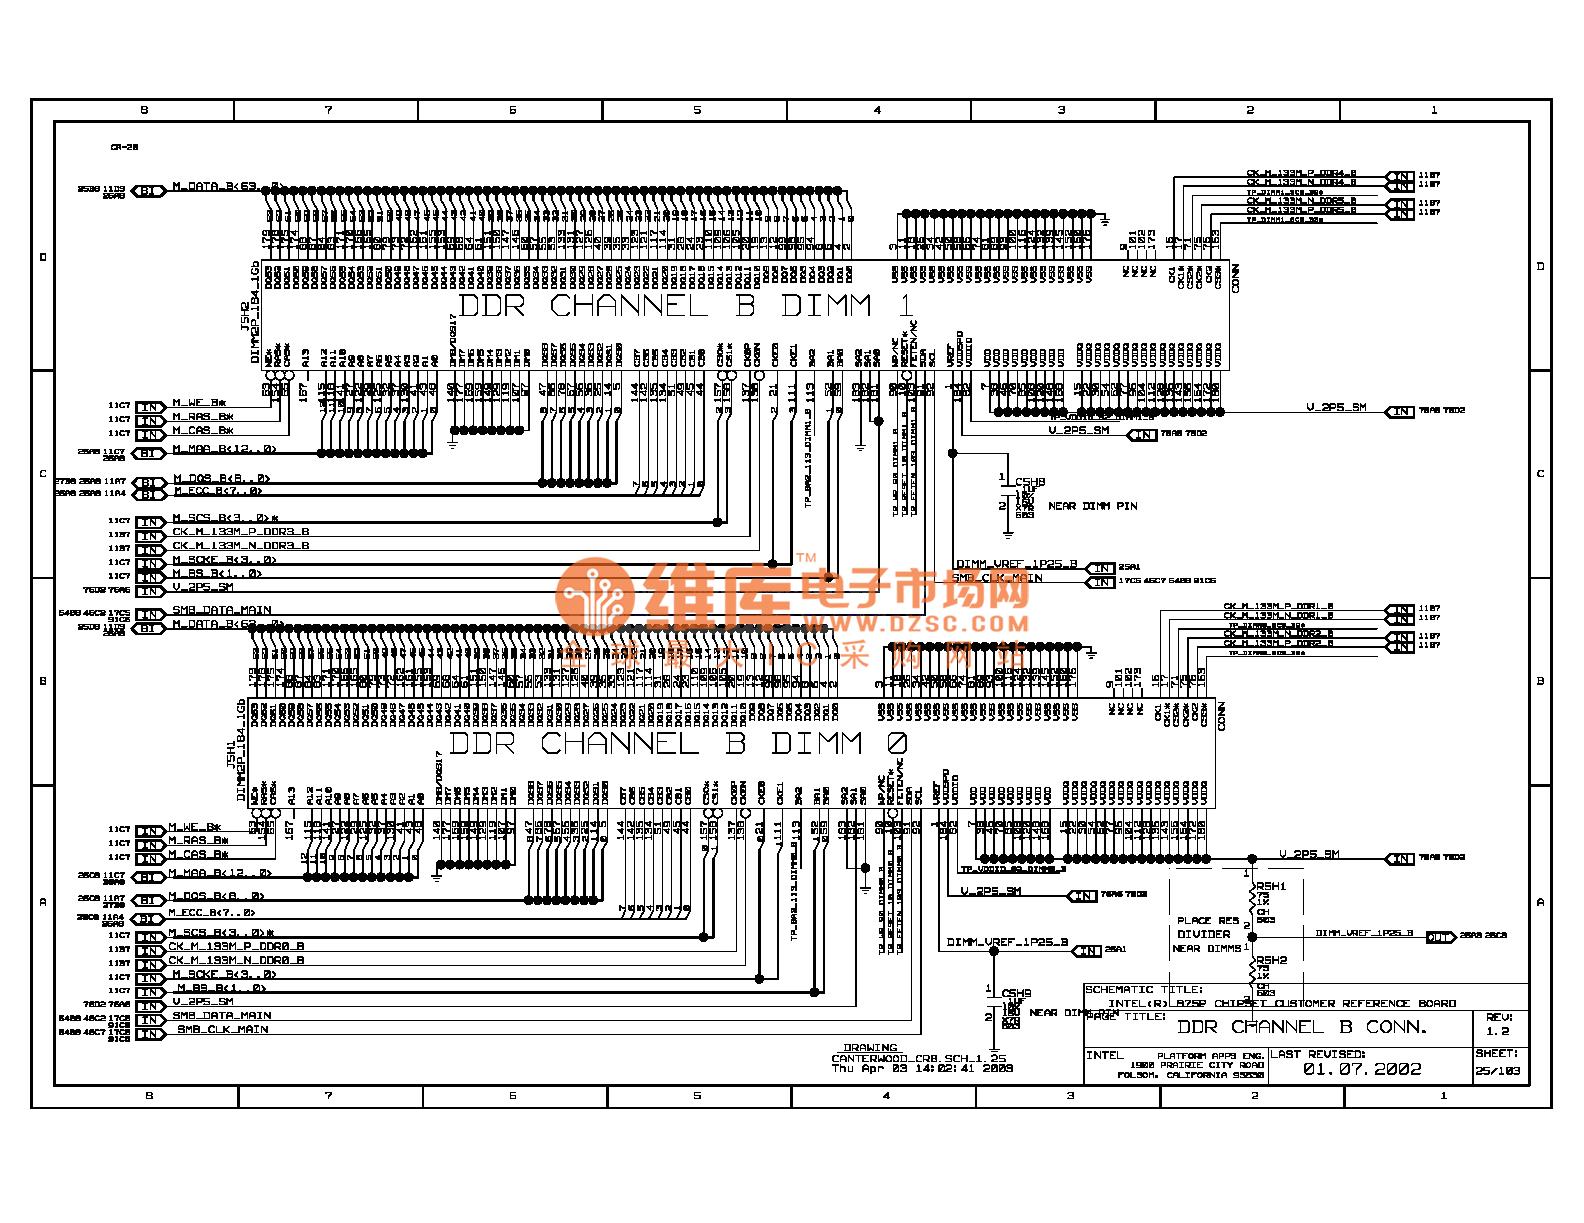 2011103120571407 conduit wiring diagram dolgular com  at fashall.co